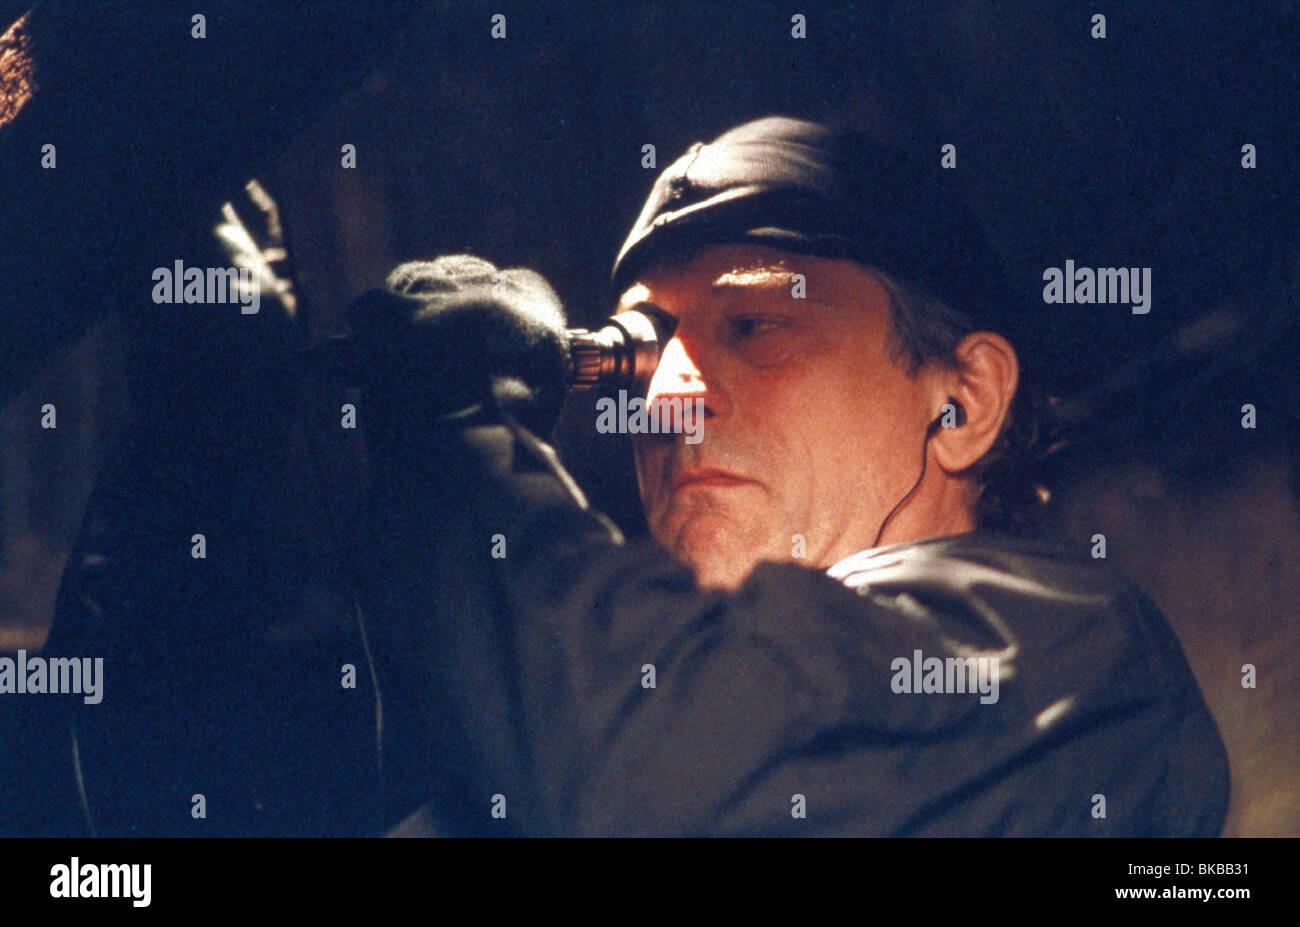 THE SCORE -2001 ROBERT DE NIRO - Stock Image